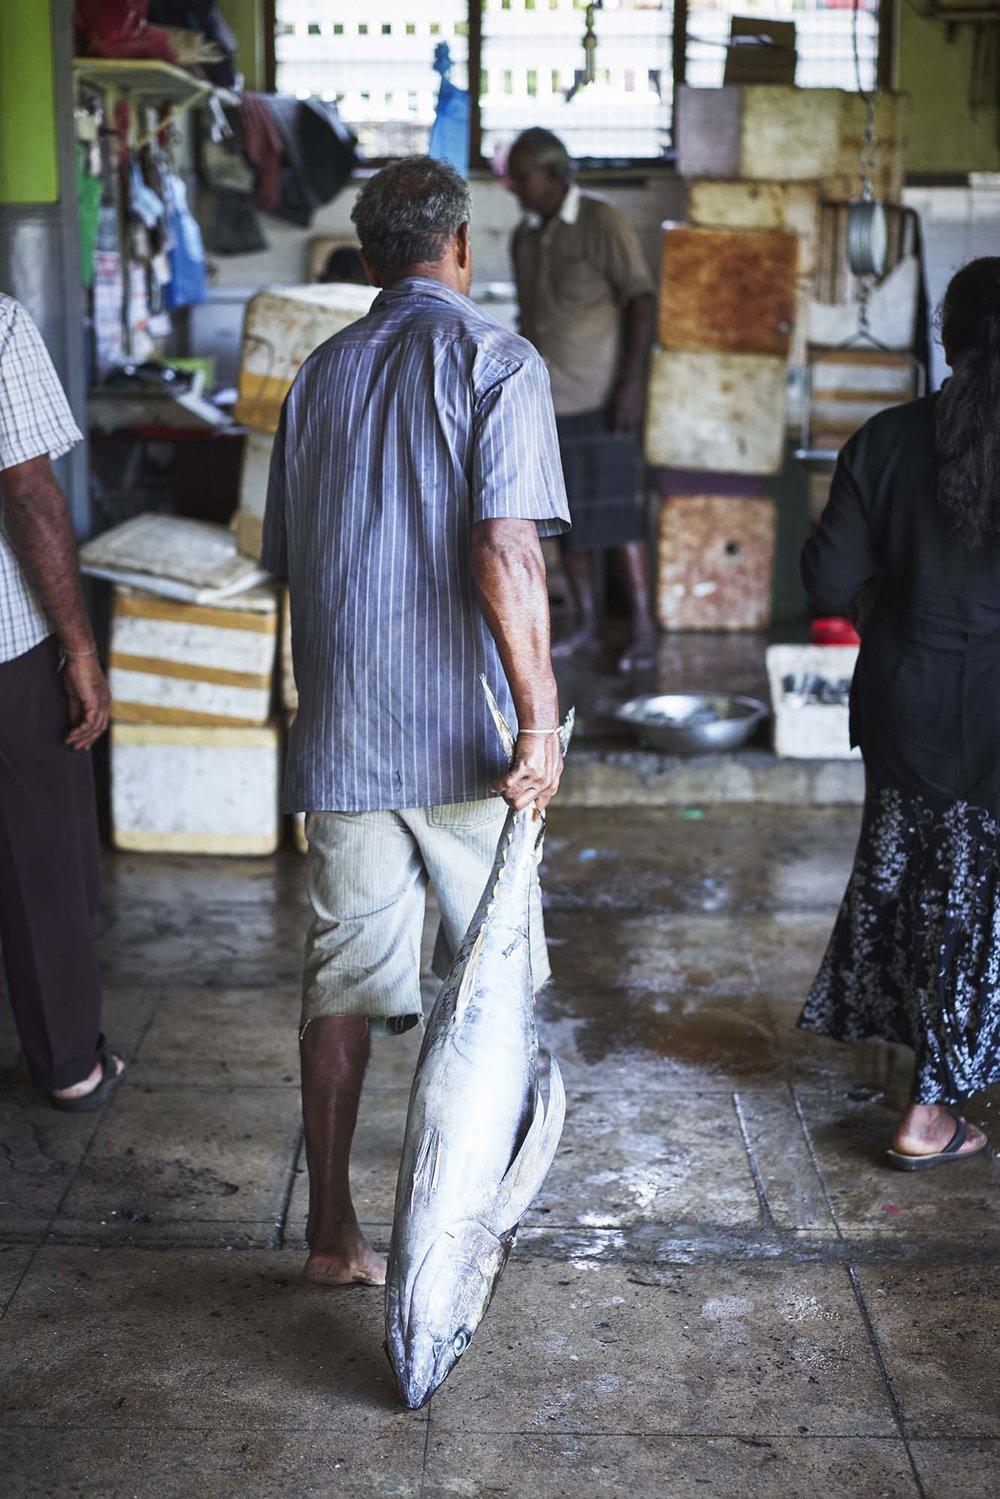 160116 Sri Lanka 0301.jpg